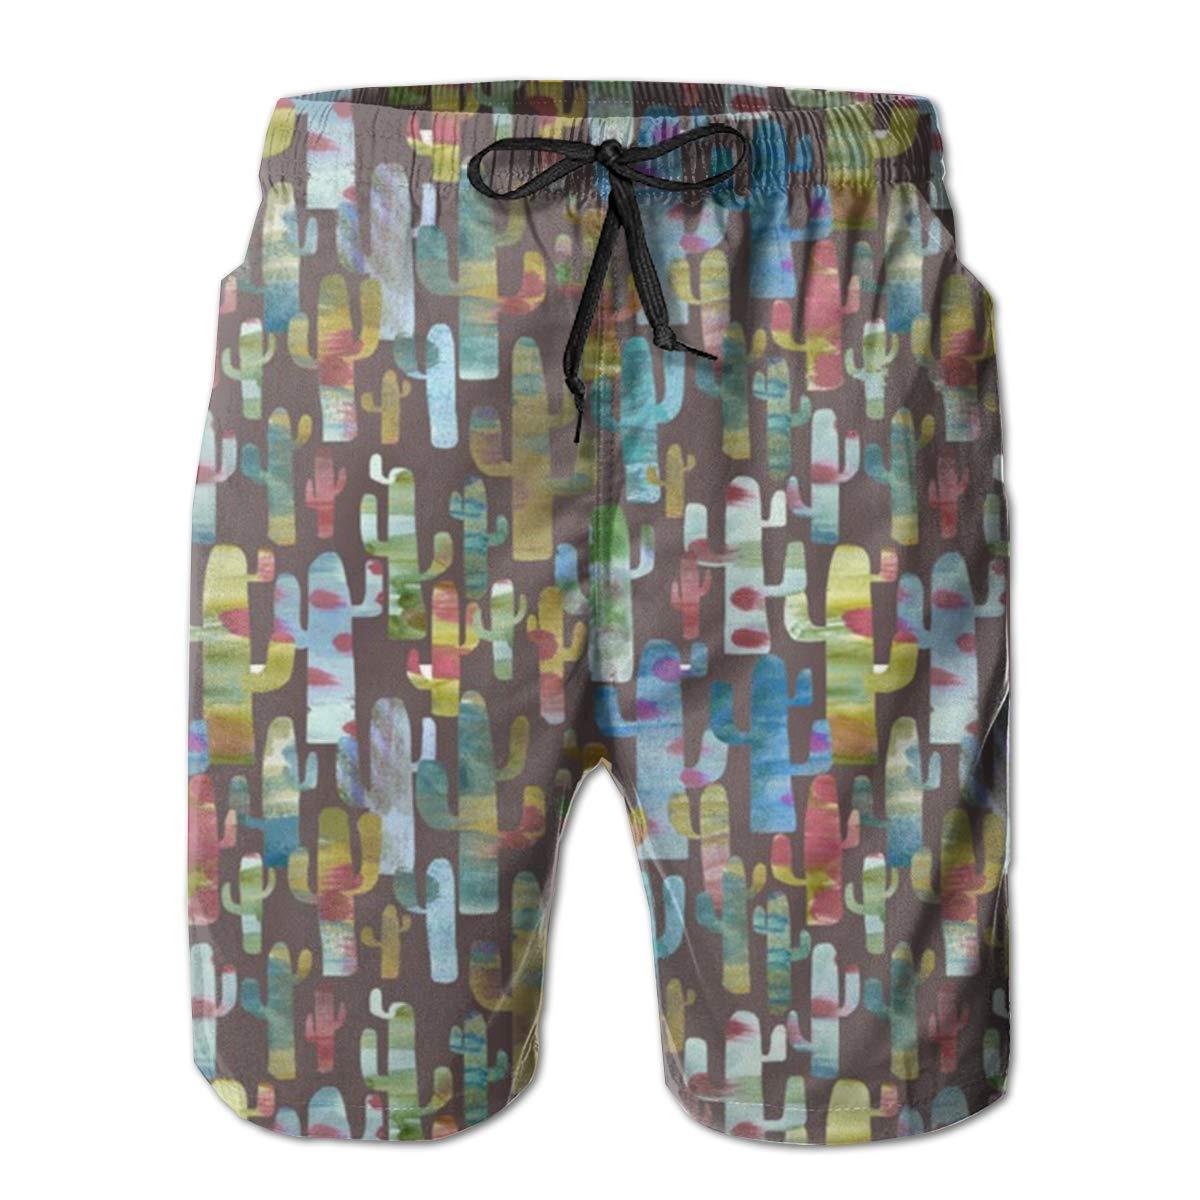 WMDJEG Colorful Individuals Cactus Mens Summer Beachwear Sports Running Swim Board Shorts Mesh Lining